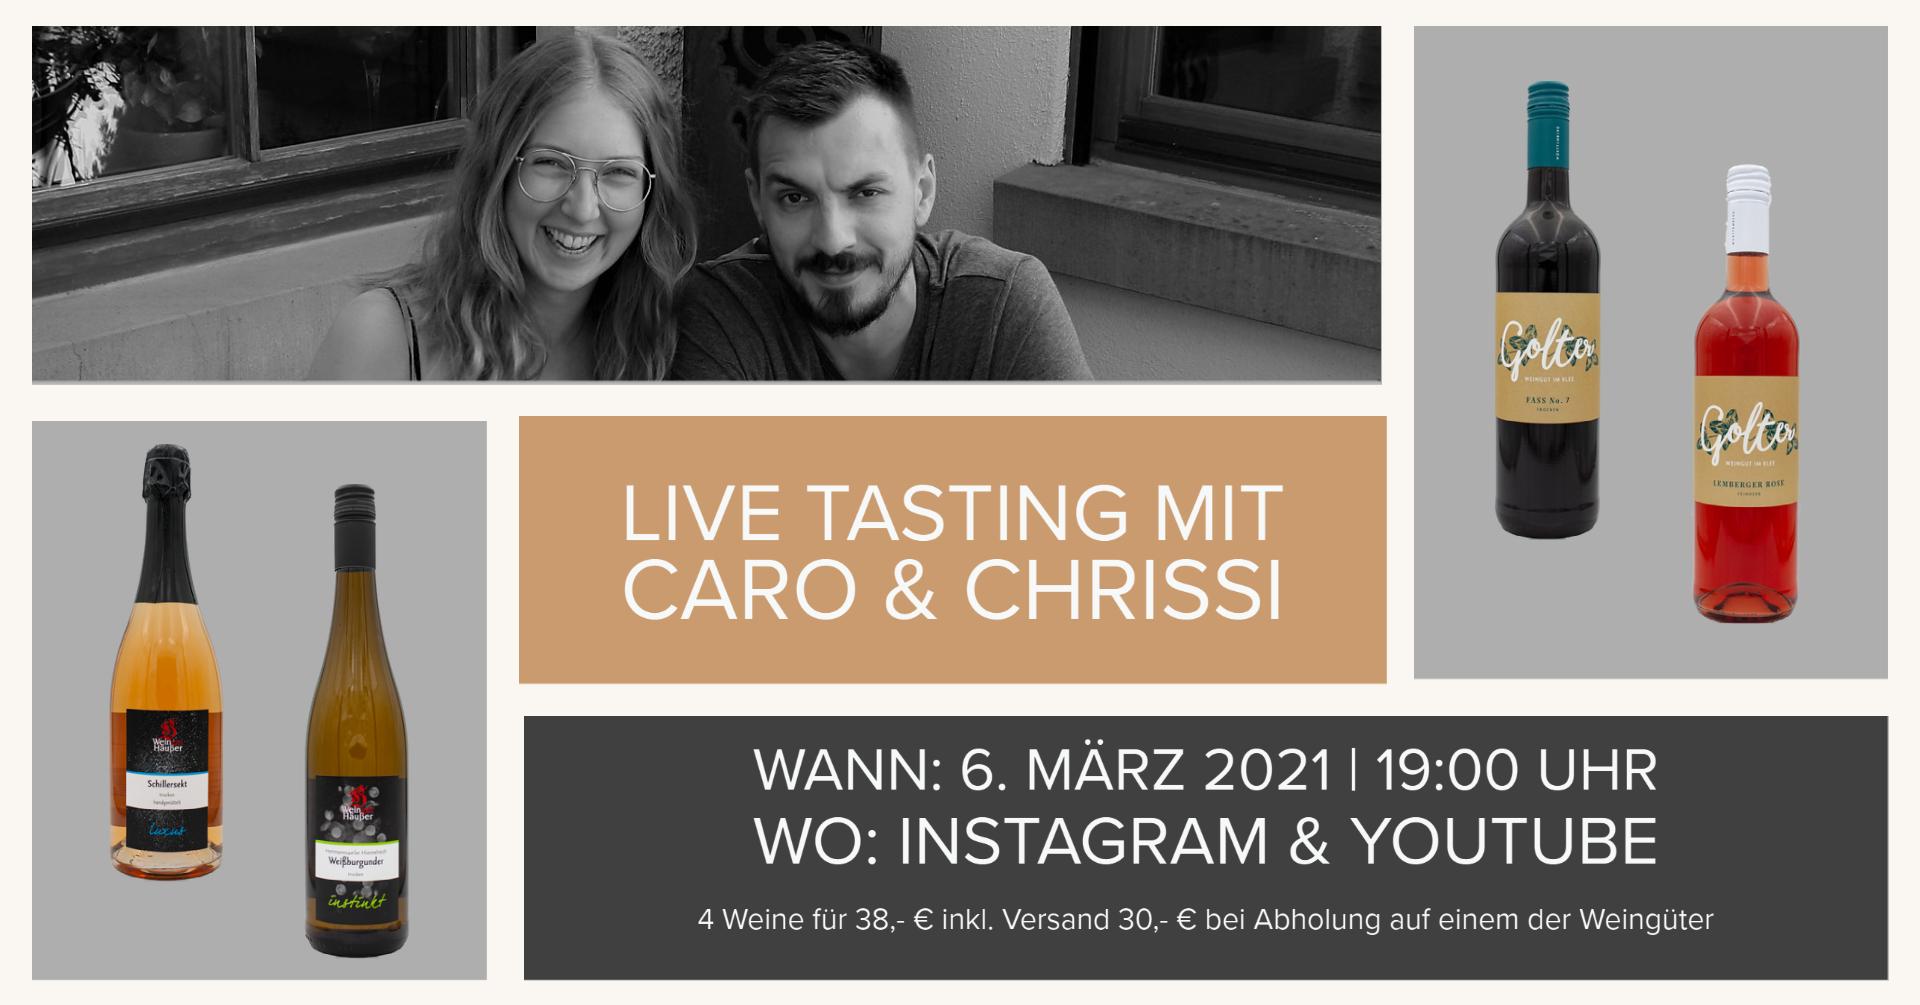 Live Tasting mit Caro & Chrissi